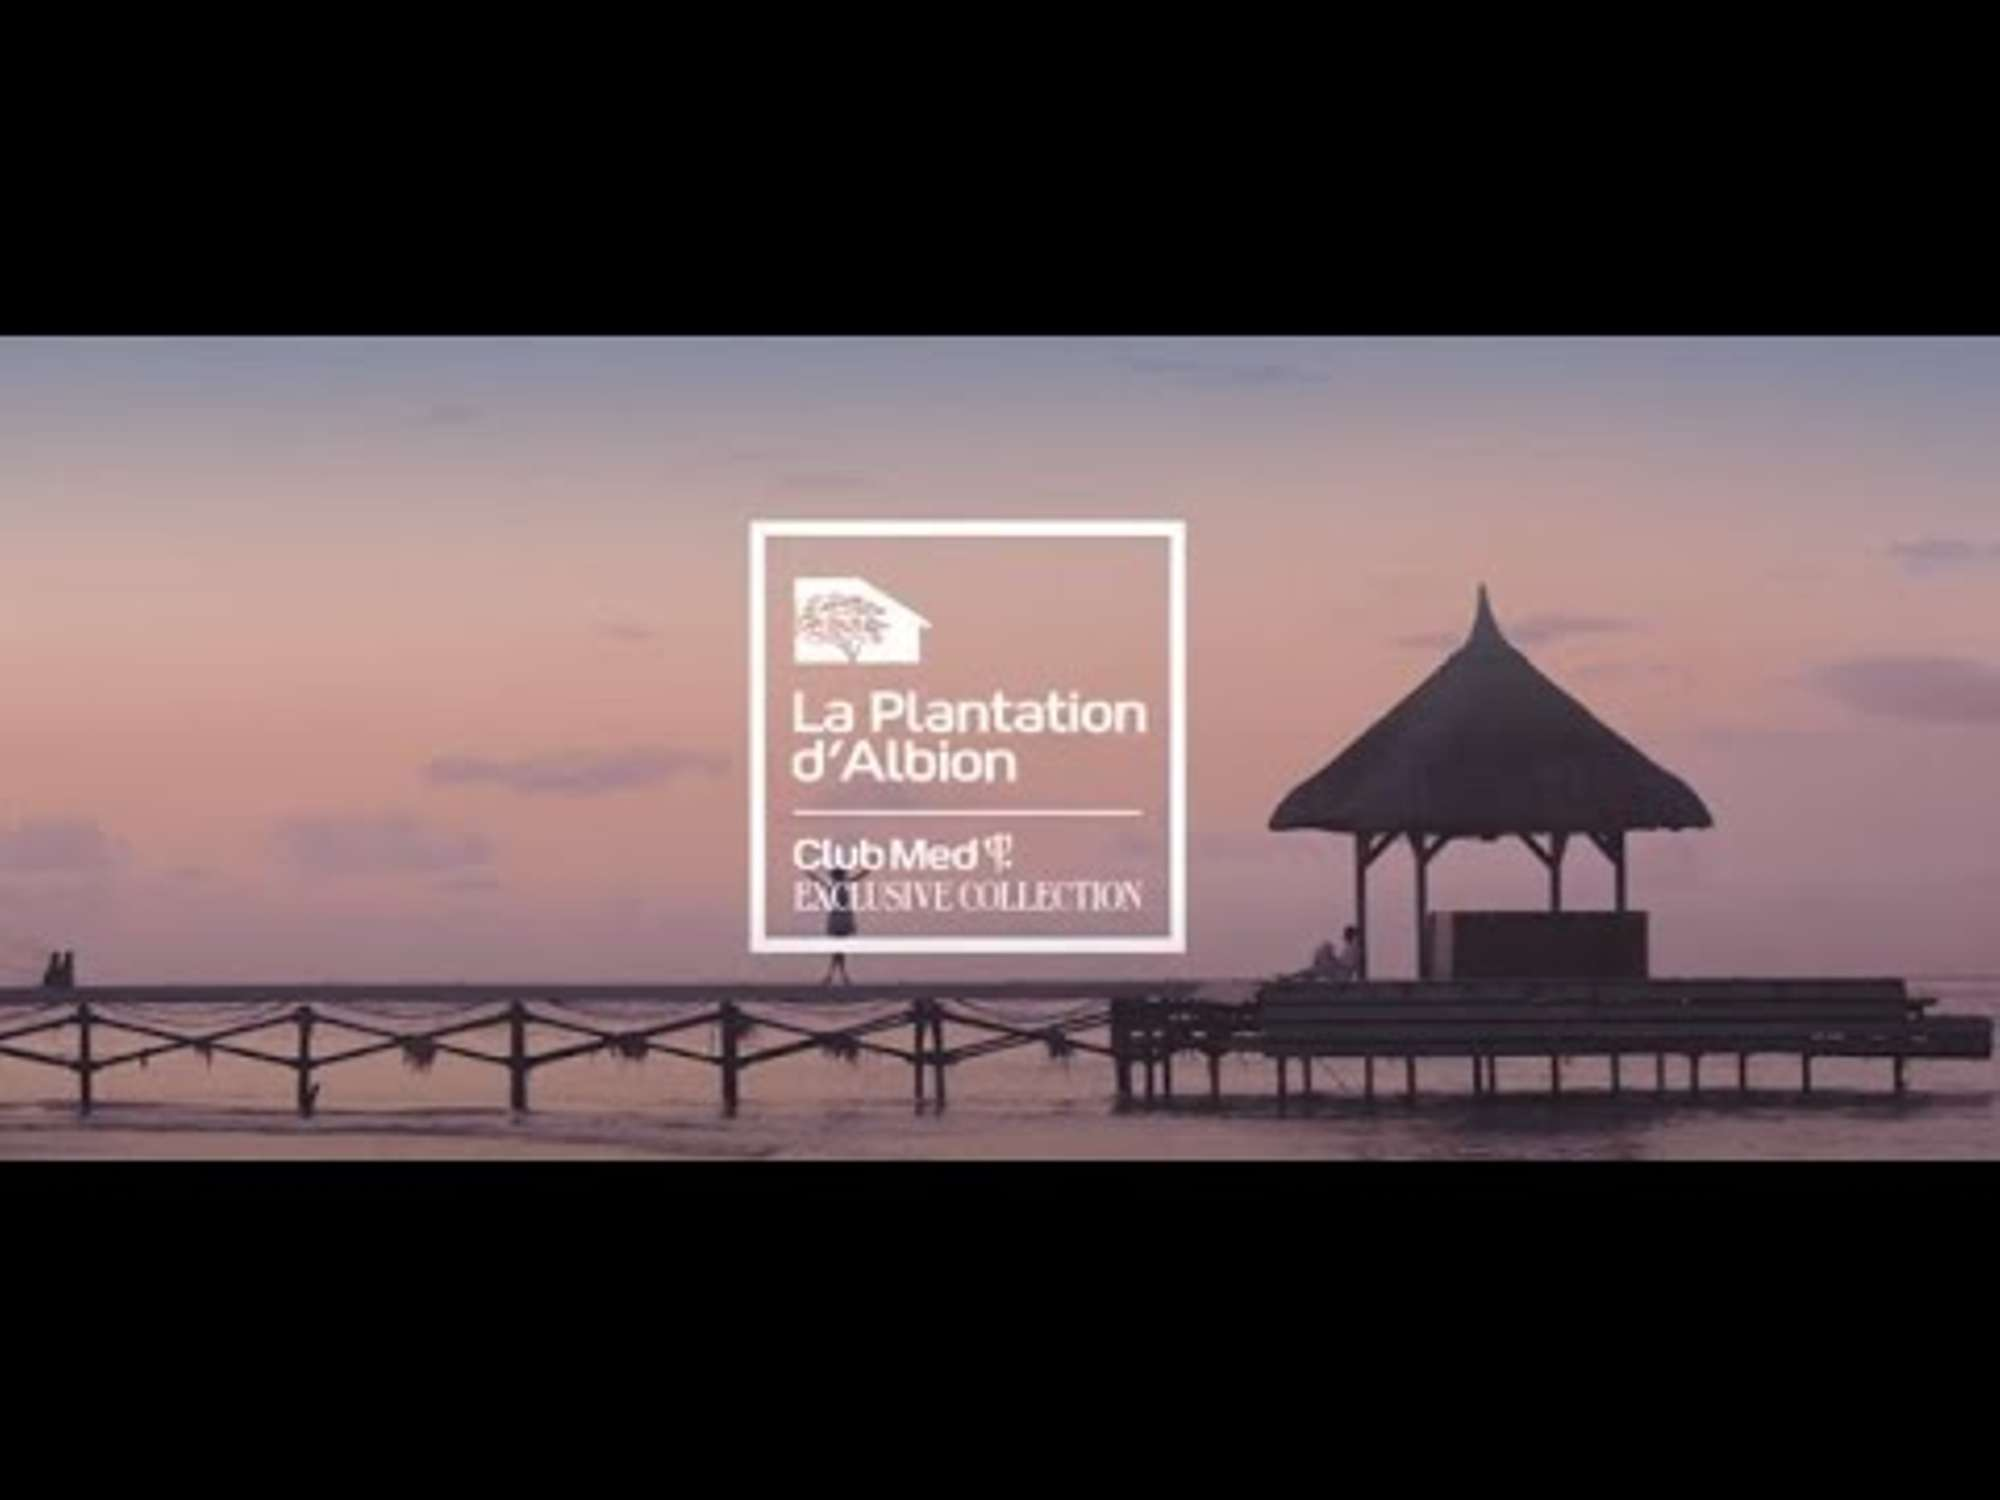 Open La Plantation d'Albion Club Med videos slideshow gallery at 1